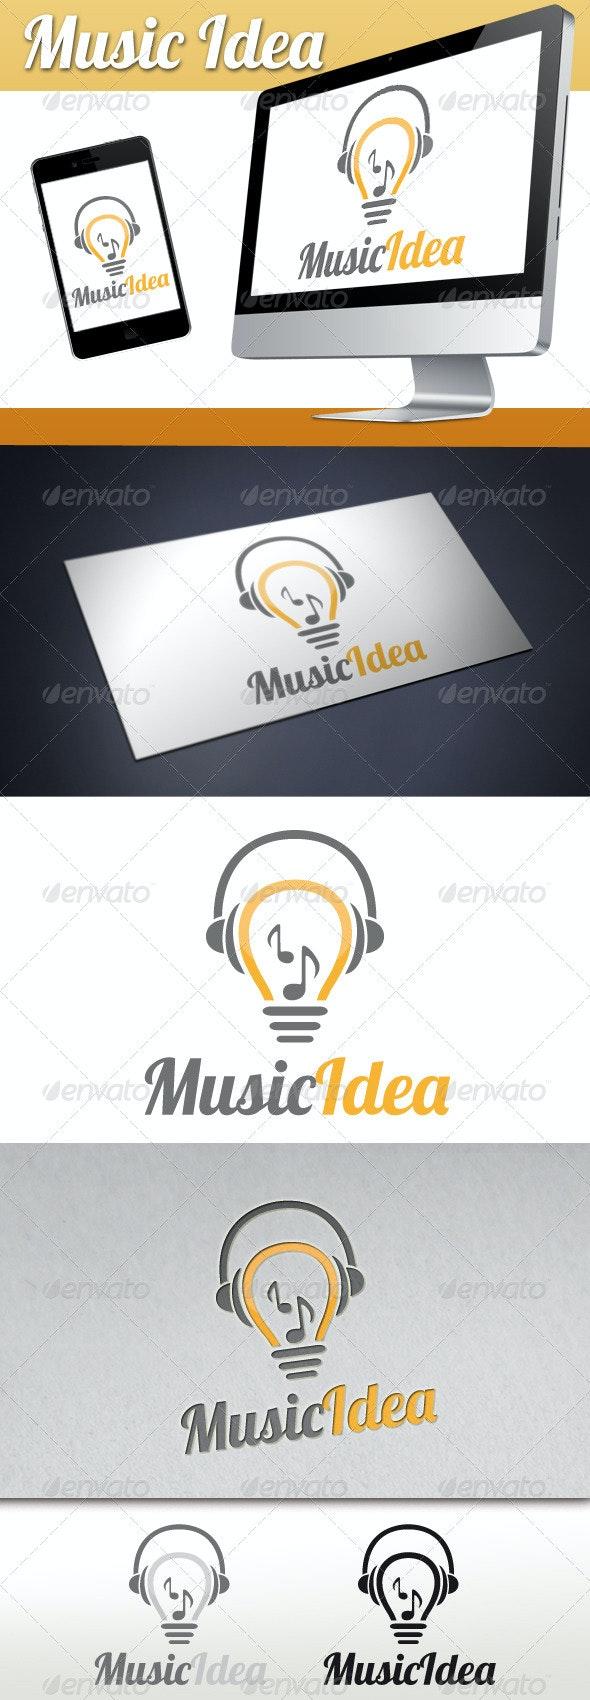 Music Idea Logo - Objects Logo Templates